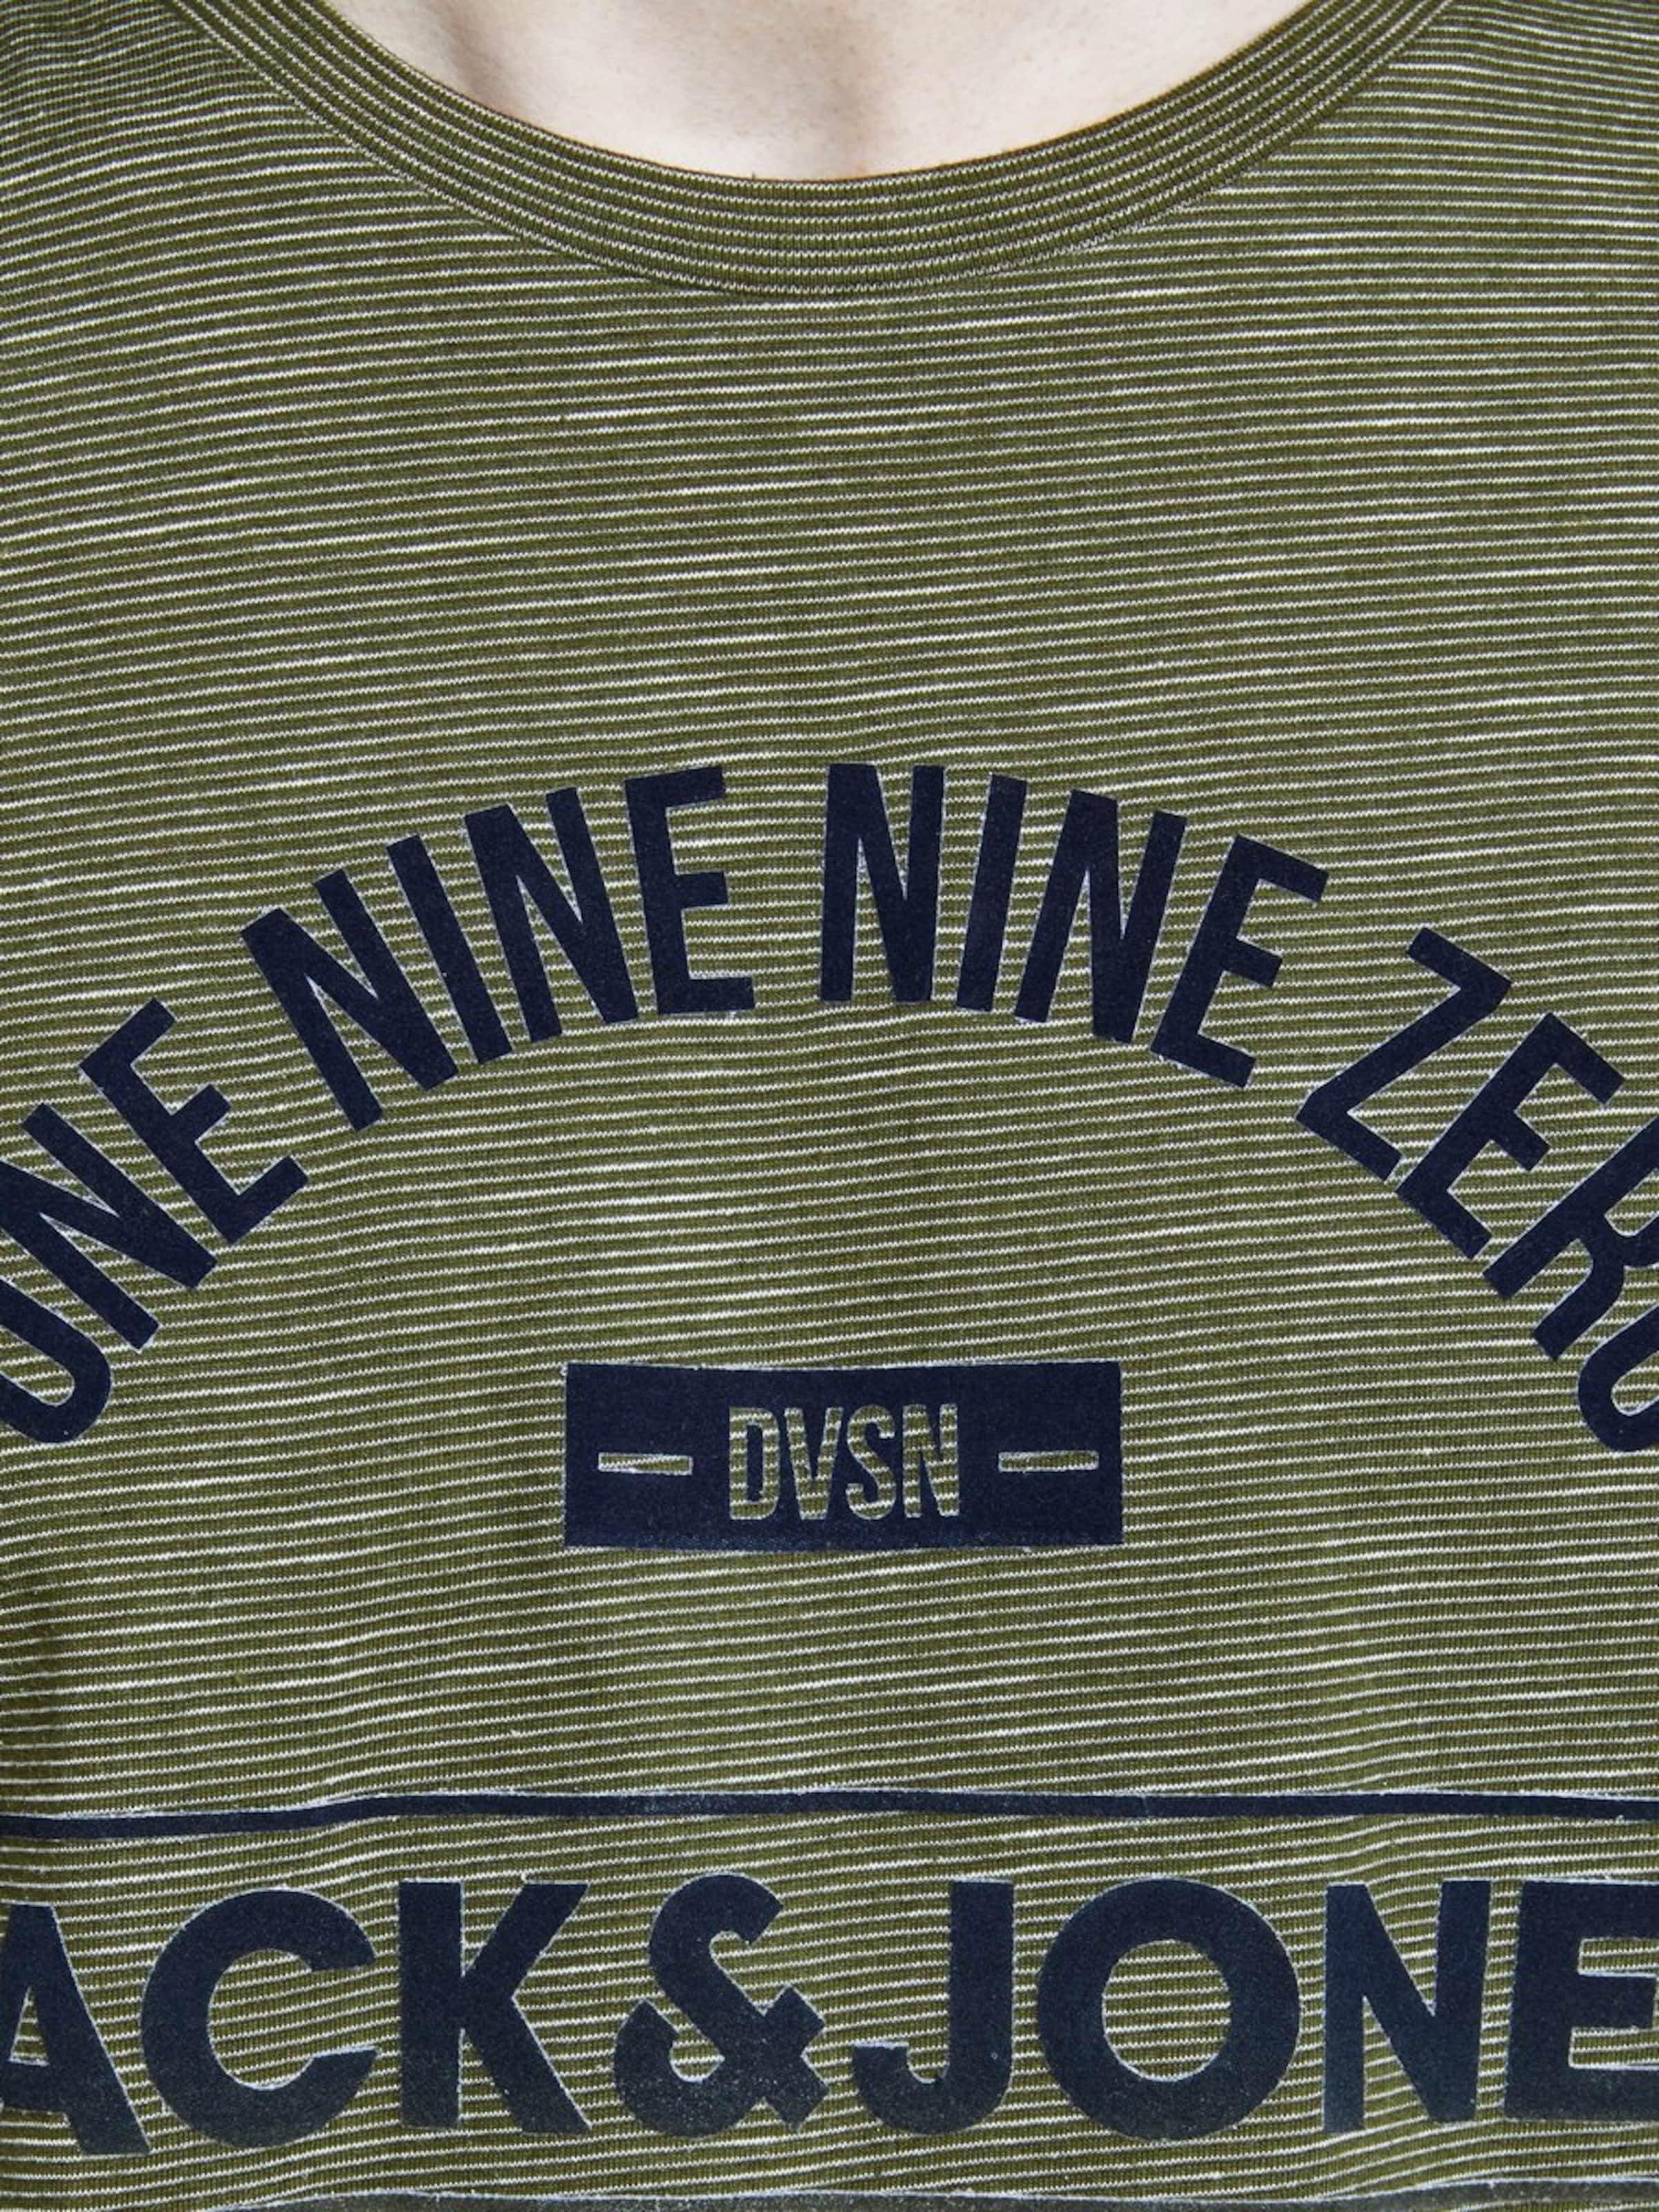 Ss Kaki Crew En Tee Jones T shirt Jackamp; Neck' 'jcomick DIWE29beHY